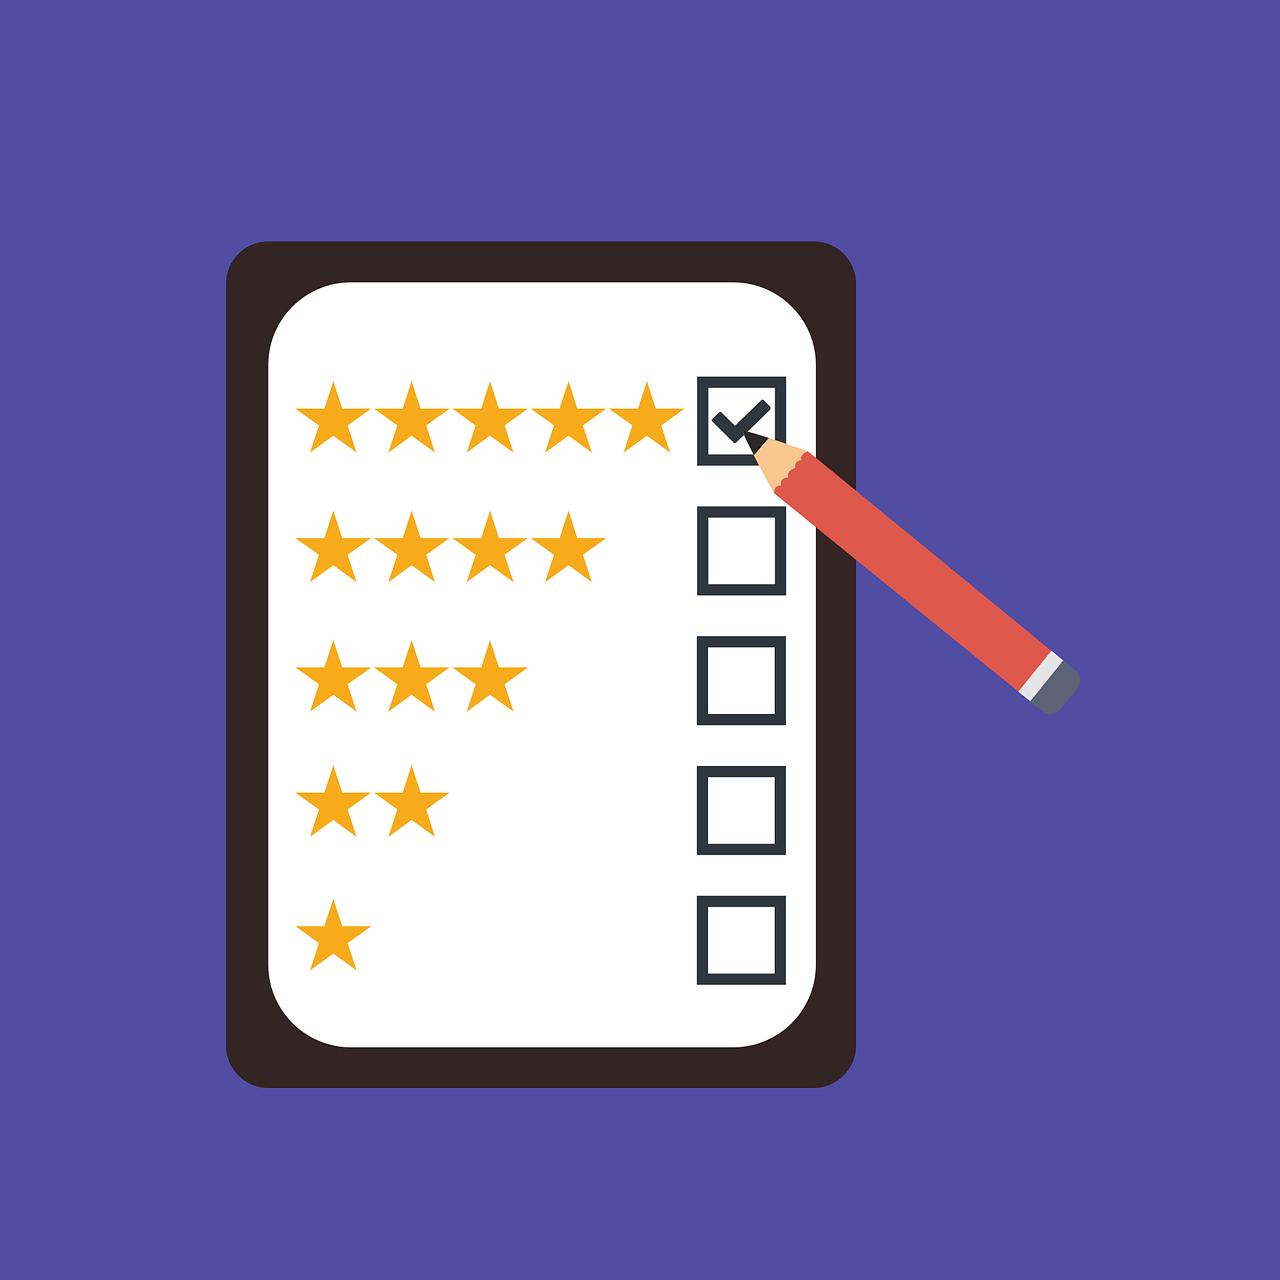 rating, user, survey